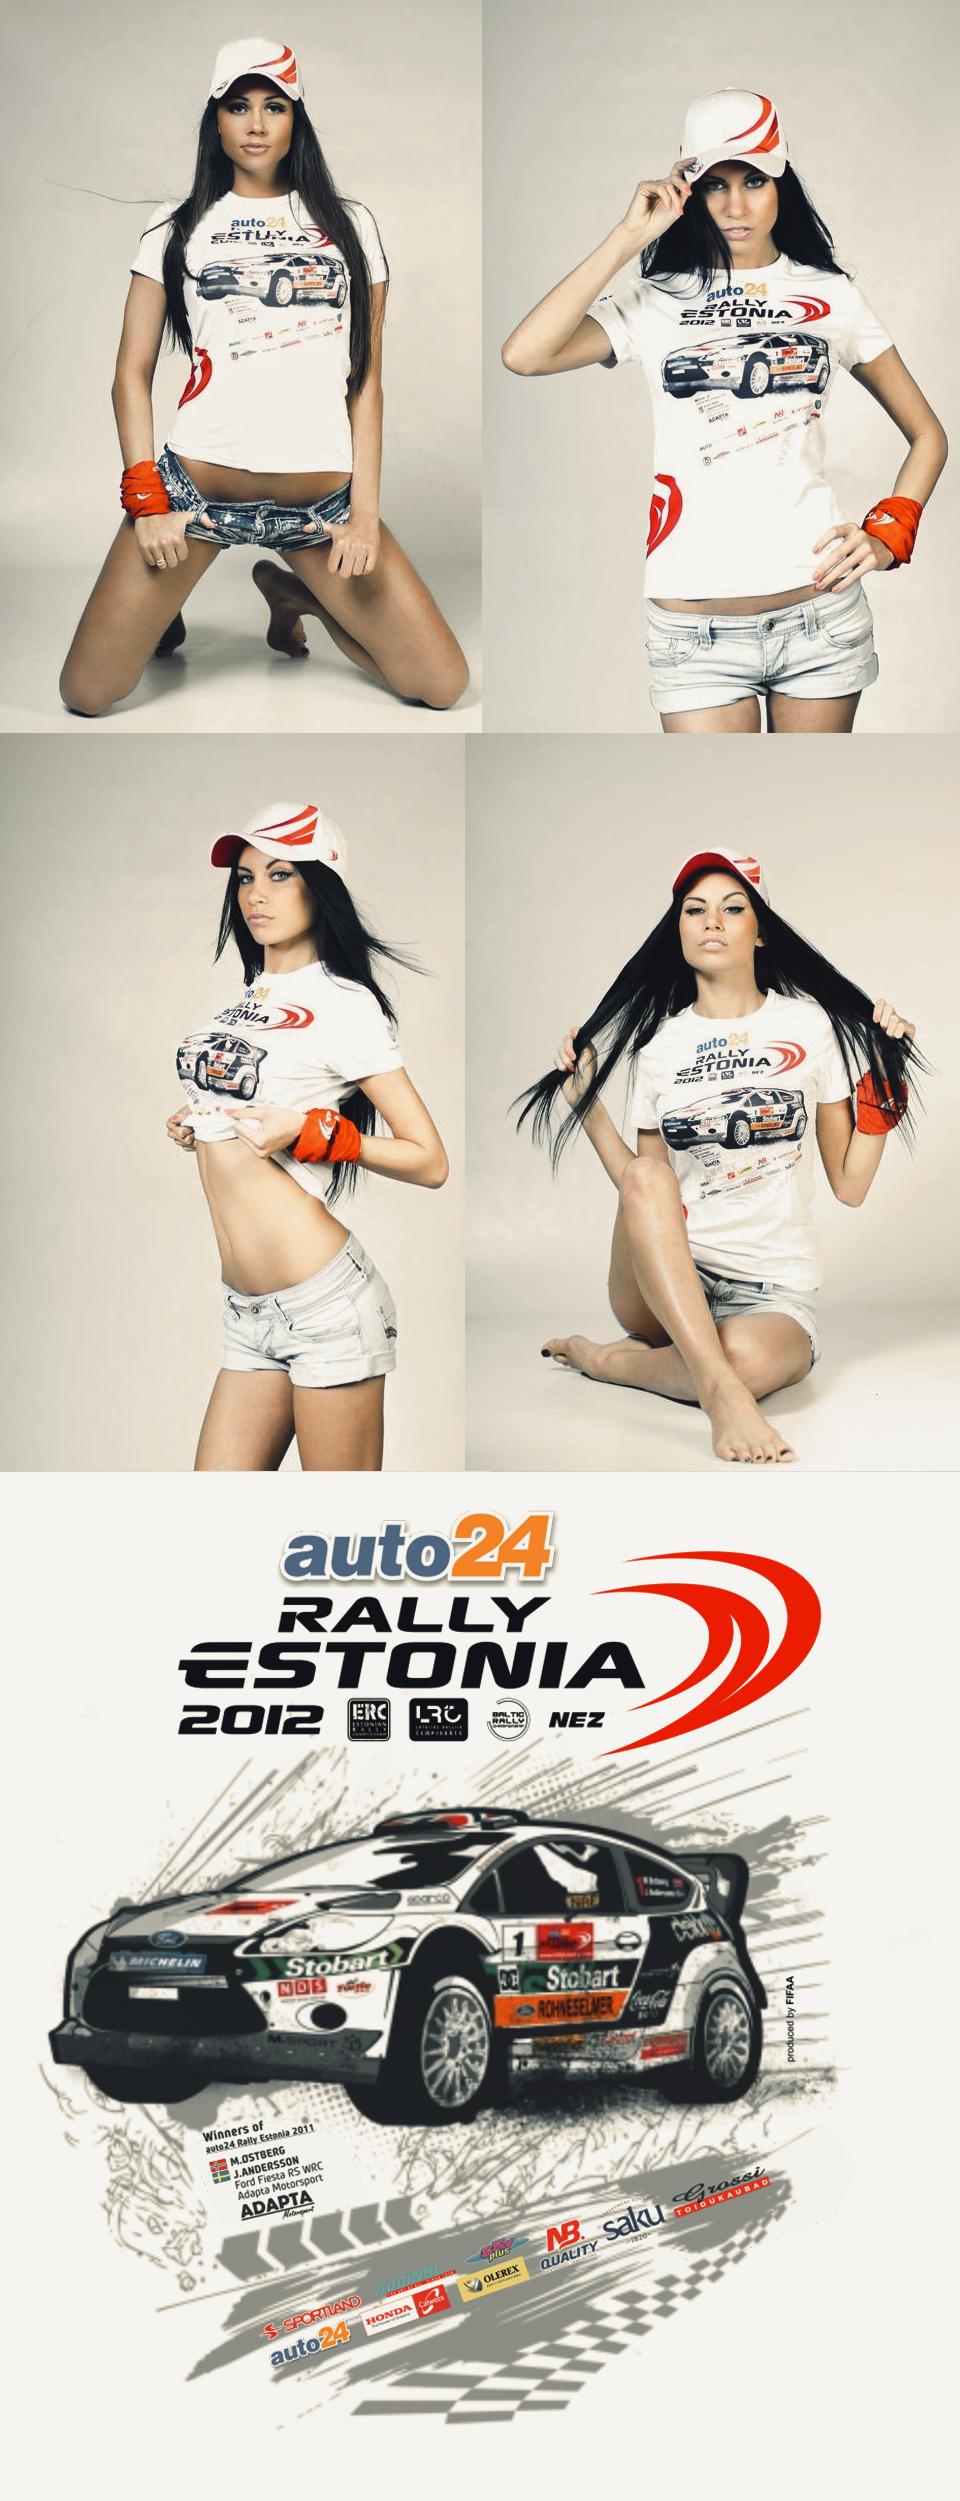 2012-RallyEstonia-1